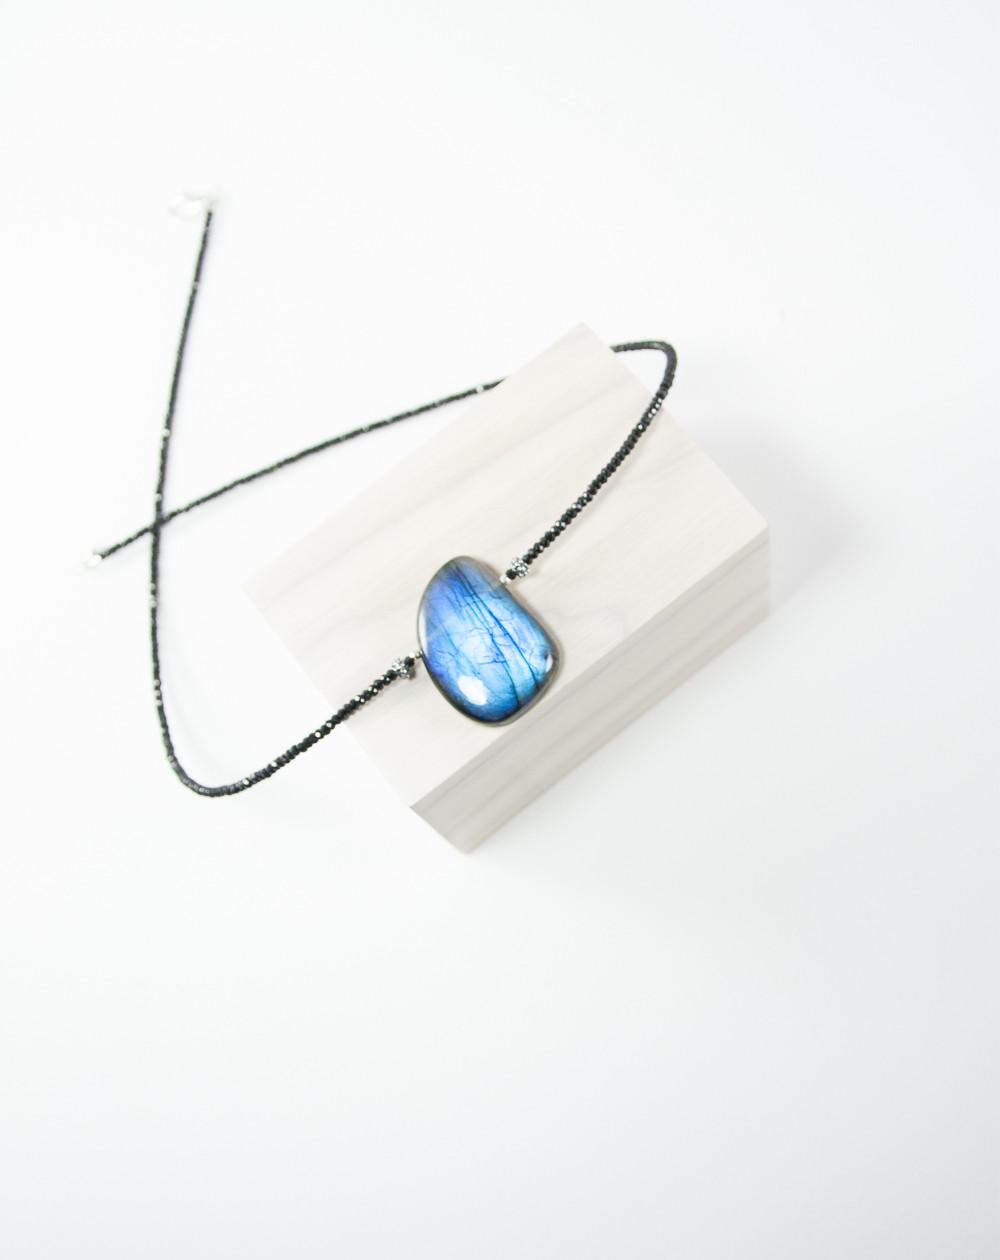 Collier en Spinelle noir pendentif en Labradorite. Sanuk Création